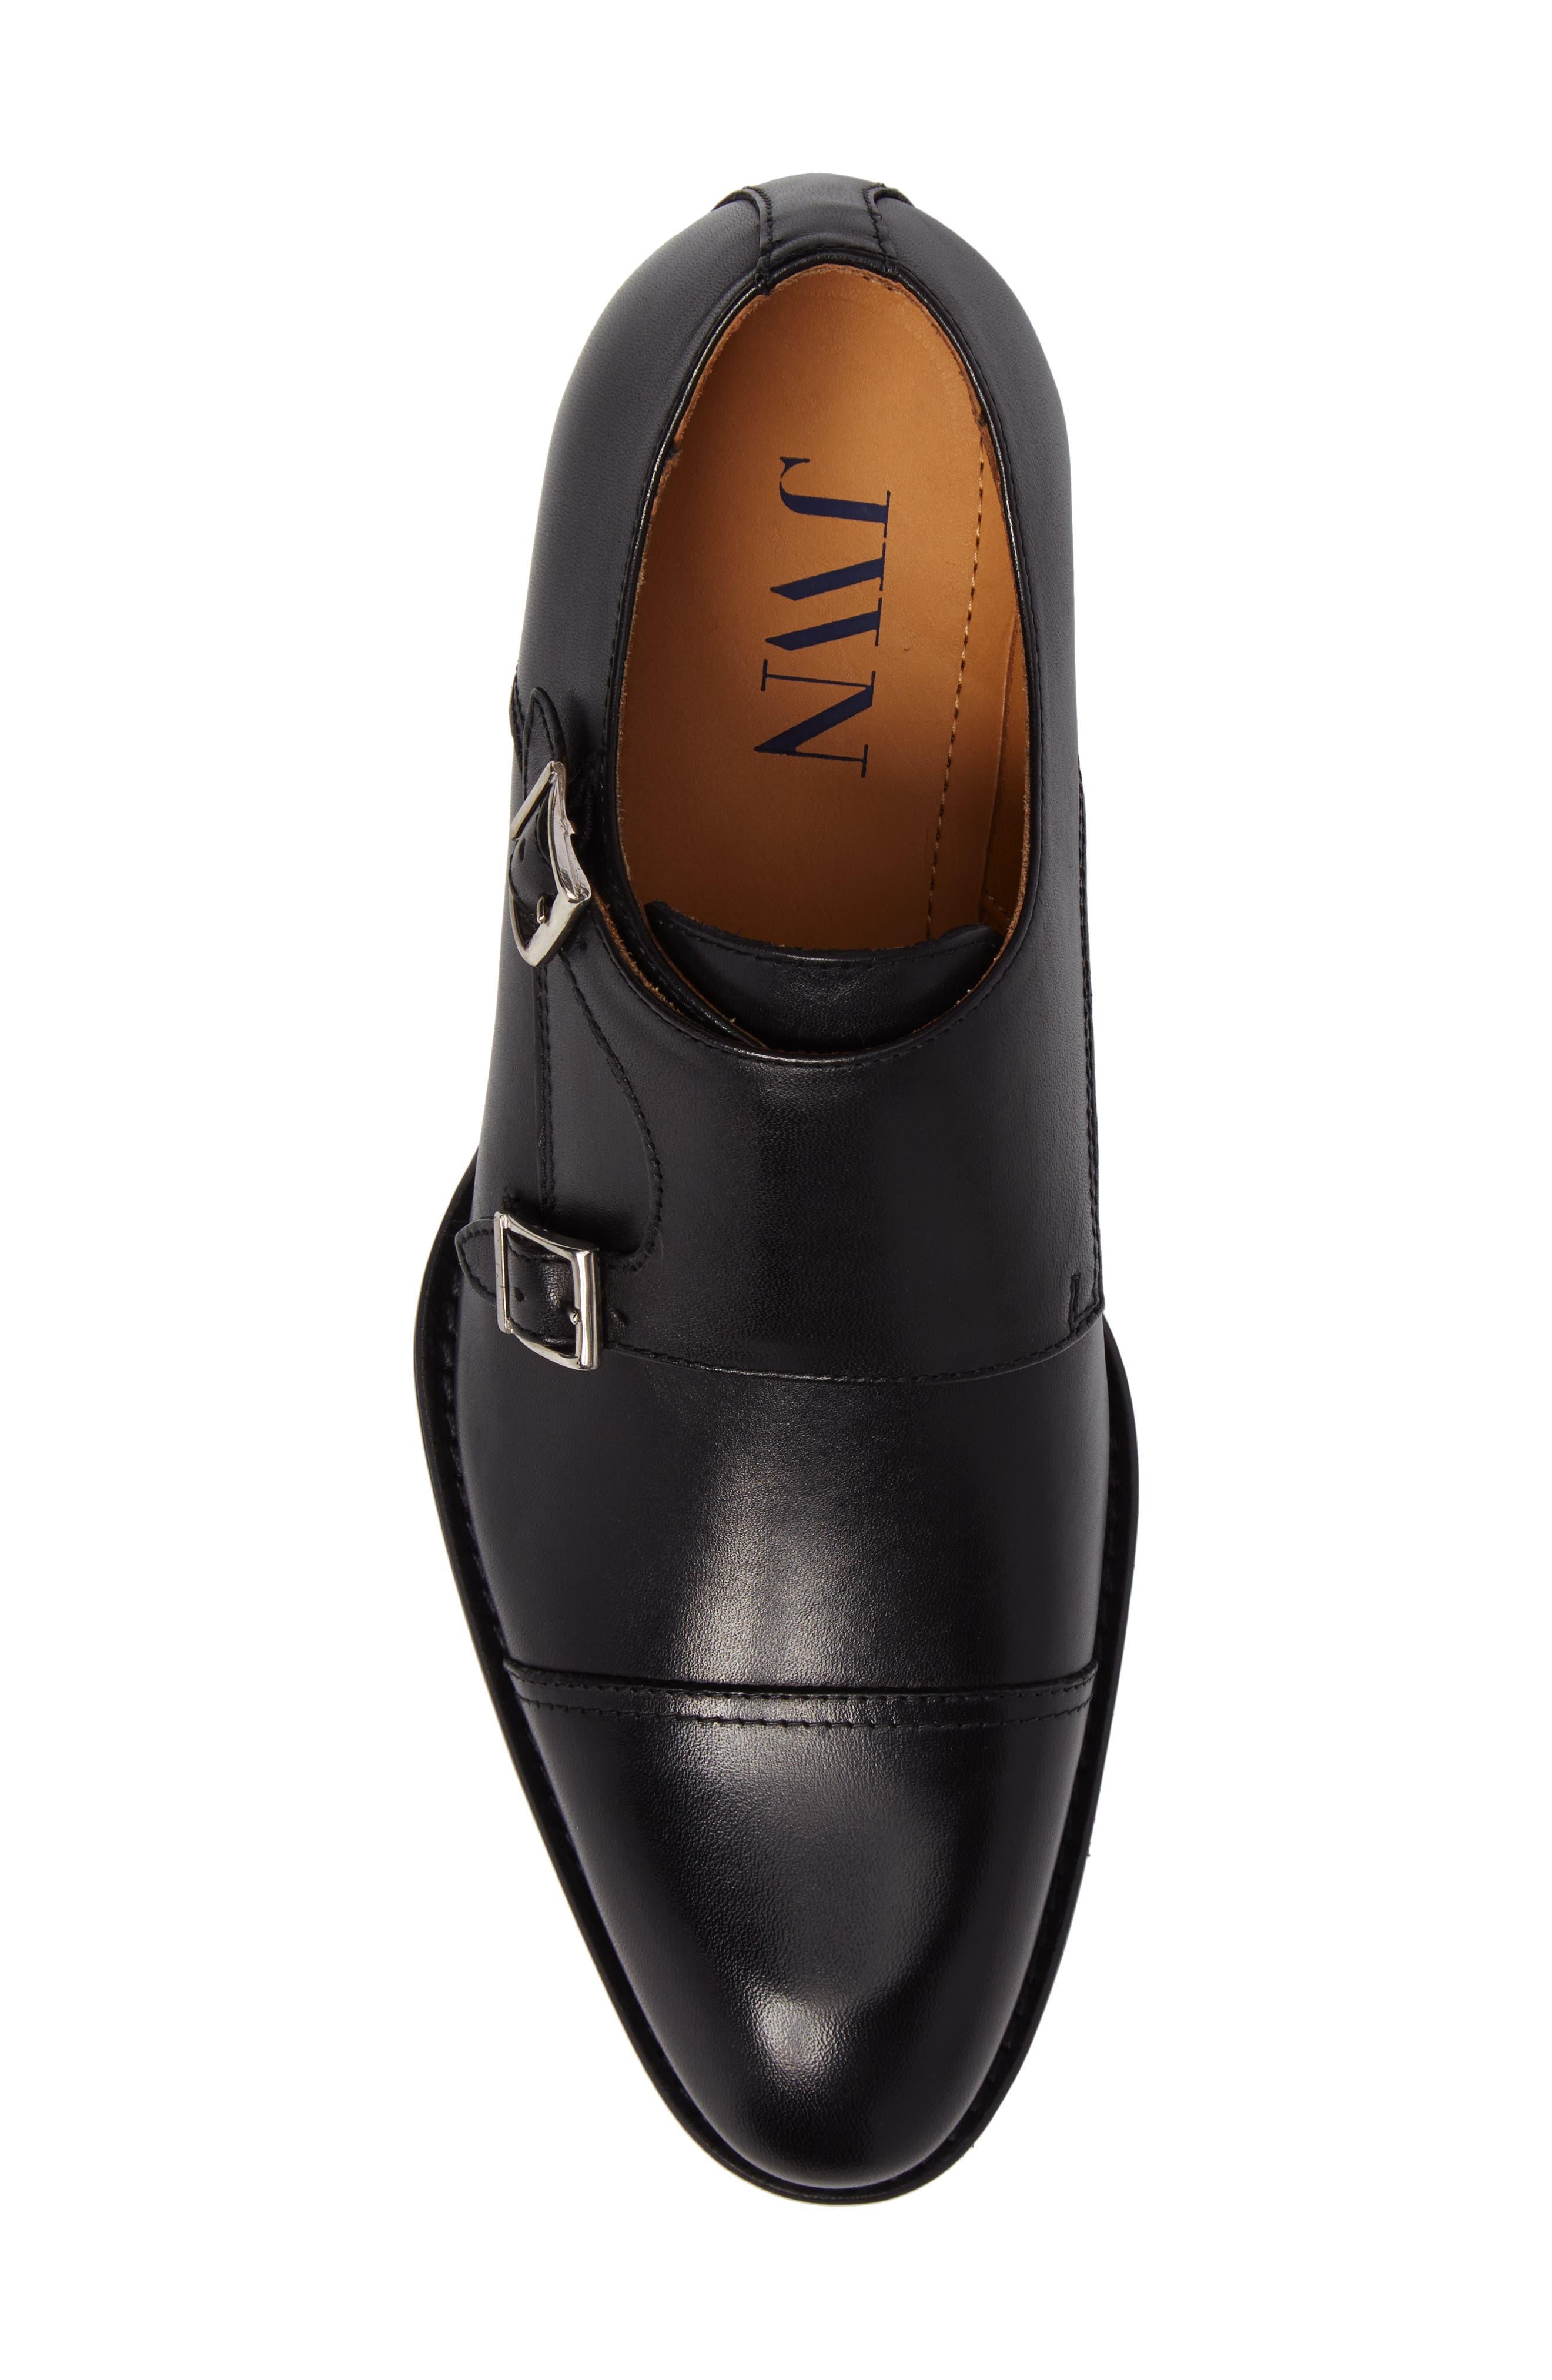 Stratton Double Monk Strap Shoe,                             Alternate thumbnail 5, color,                             001